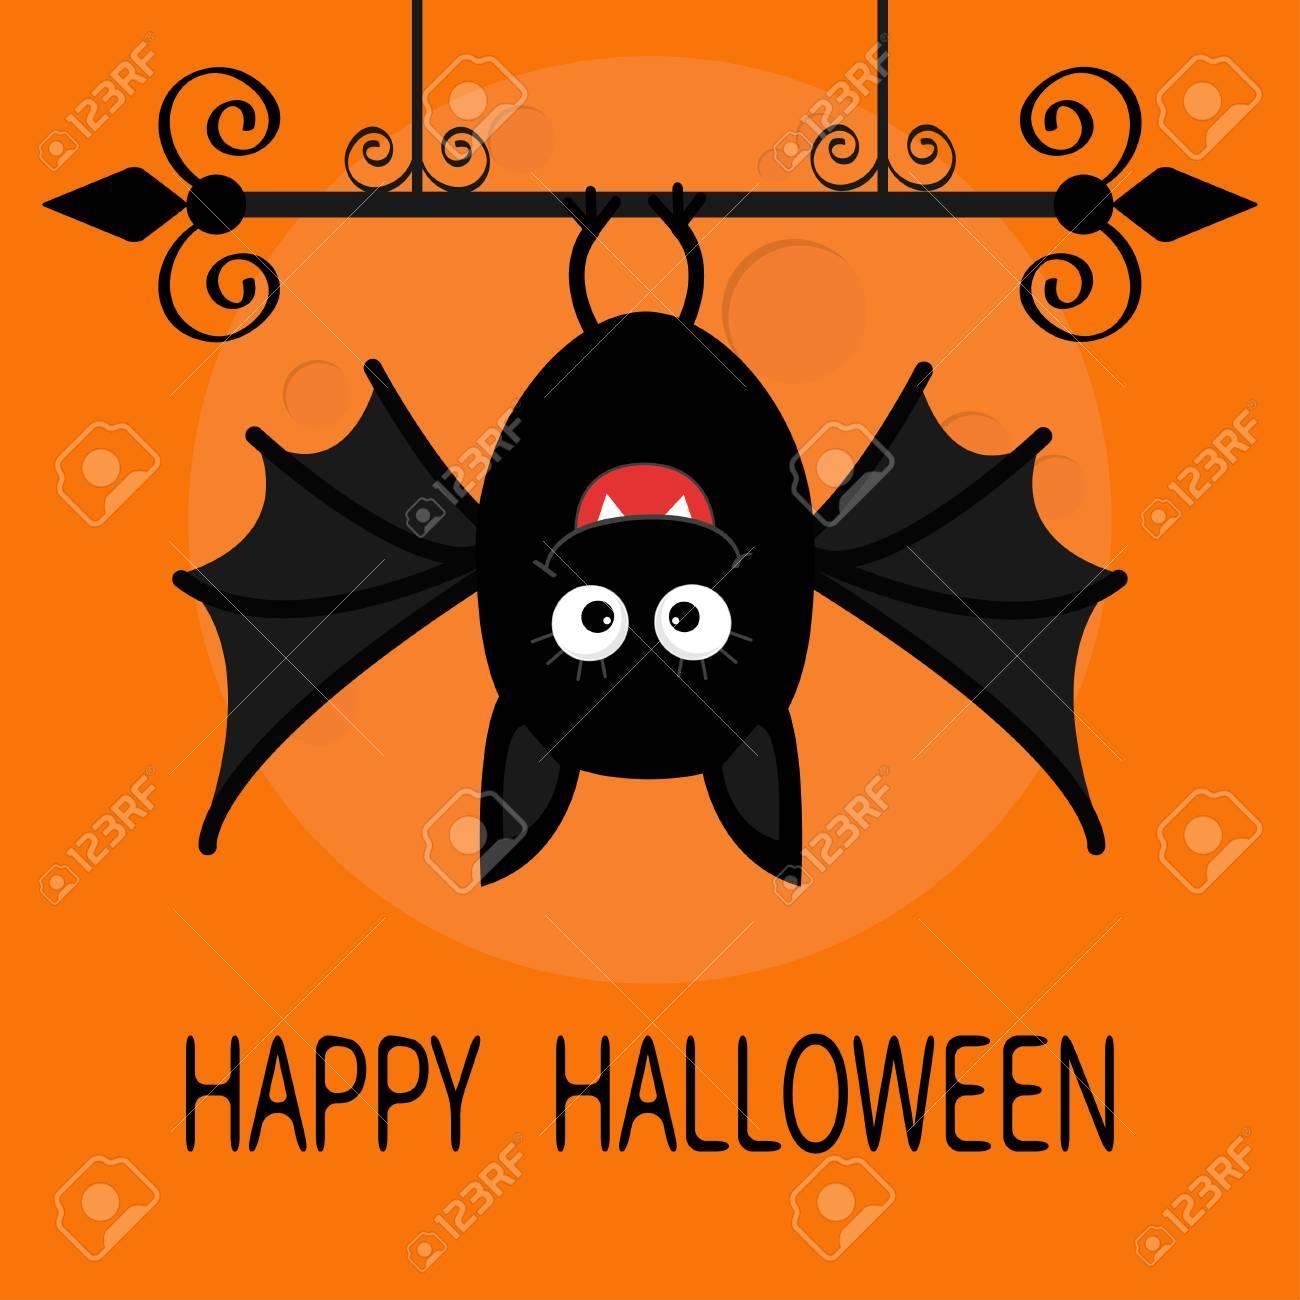 Happy Halloween Card Cute Cartoon Hanging Bat Animal Character